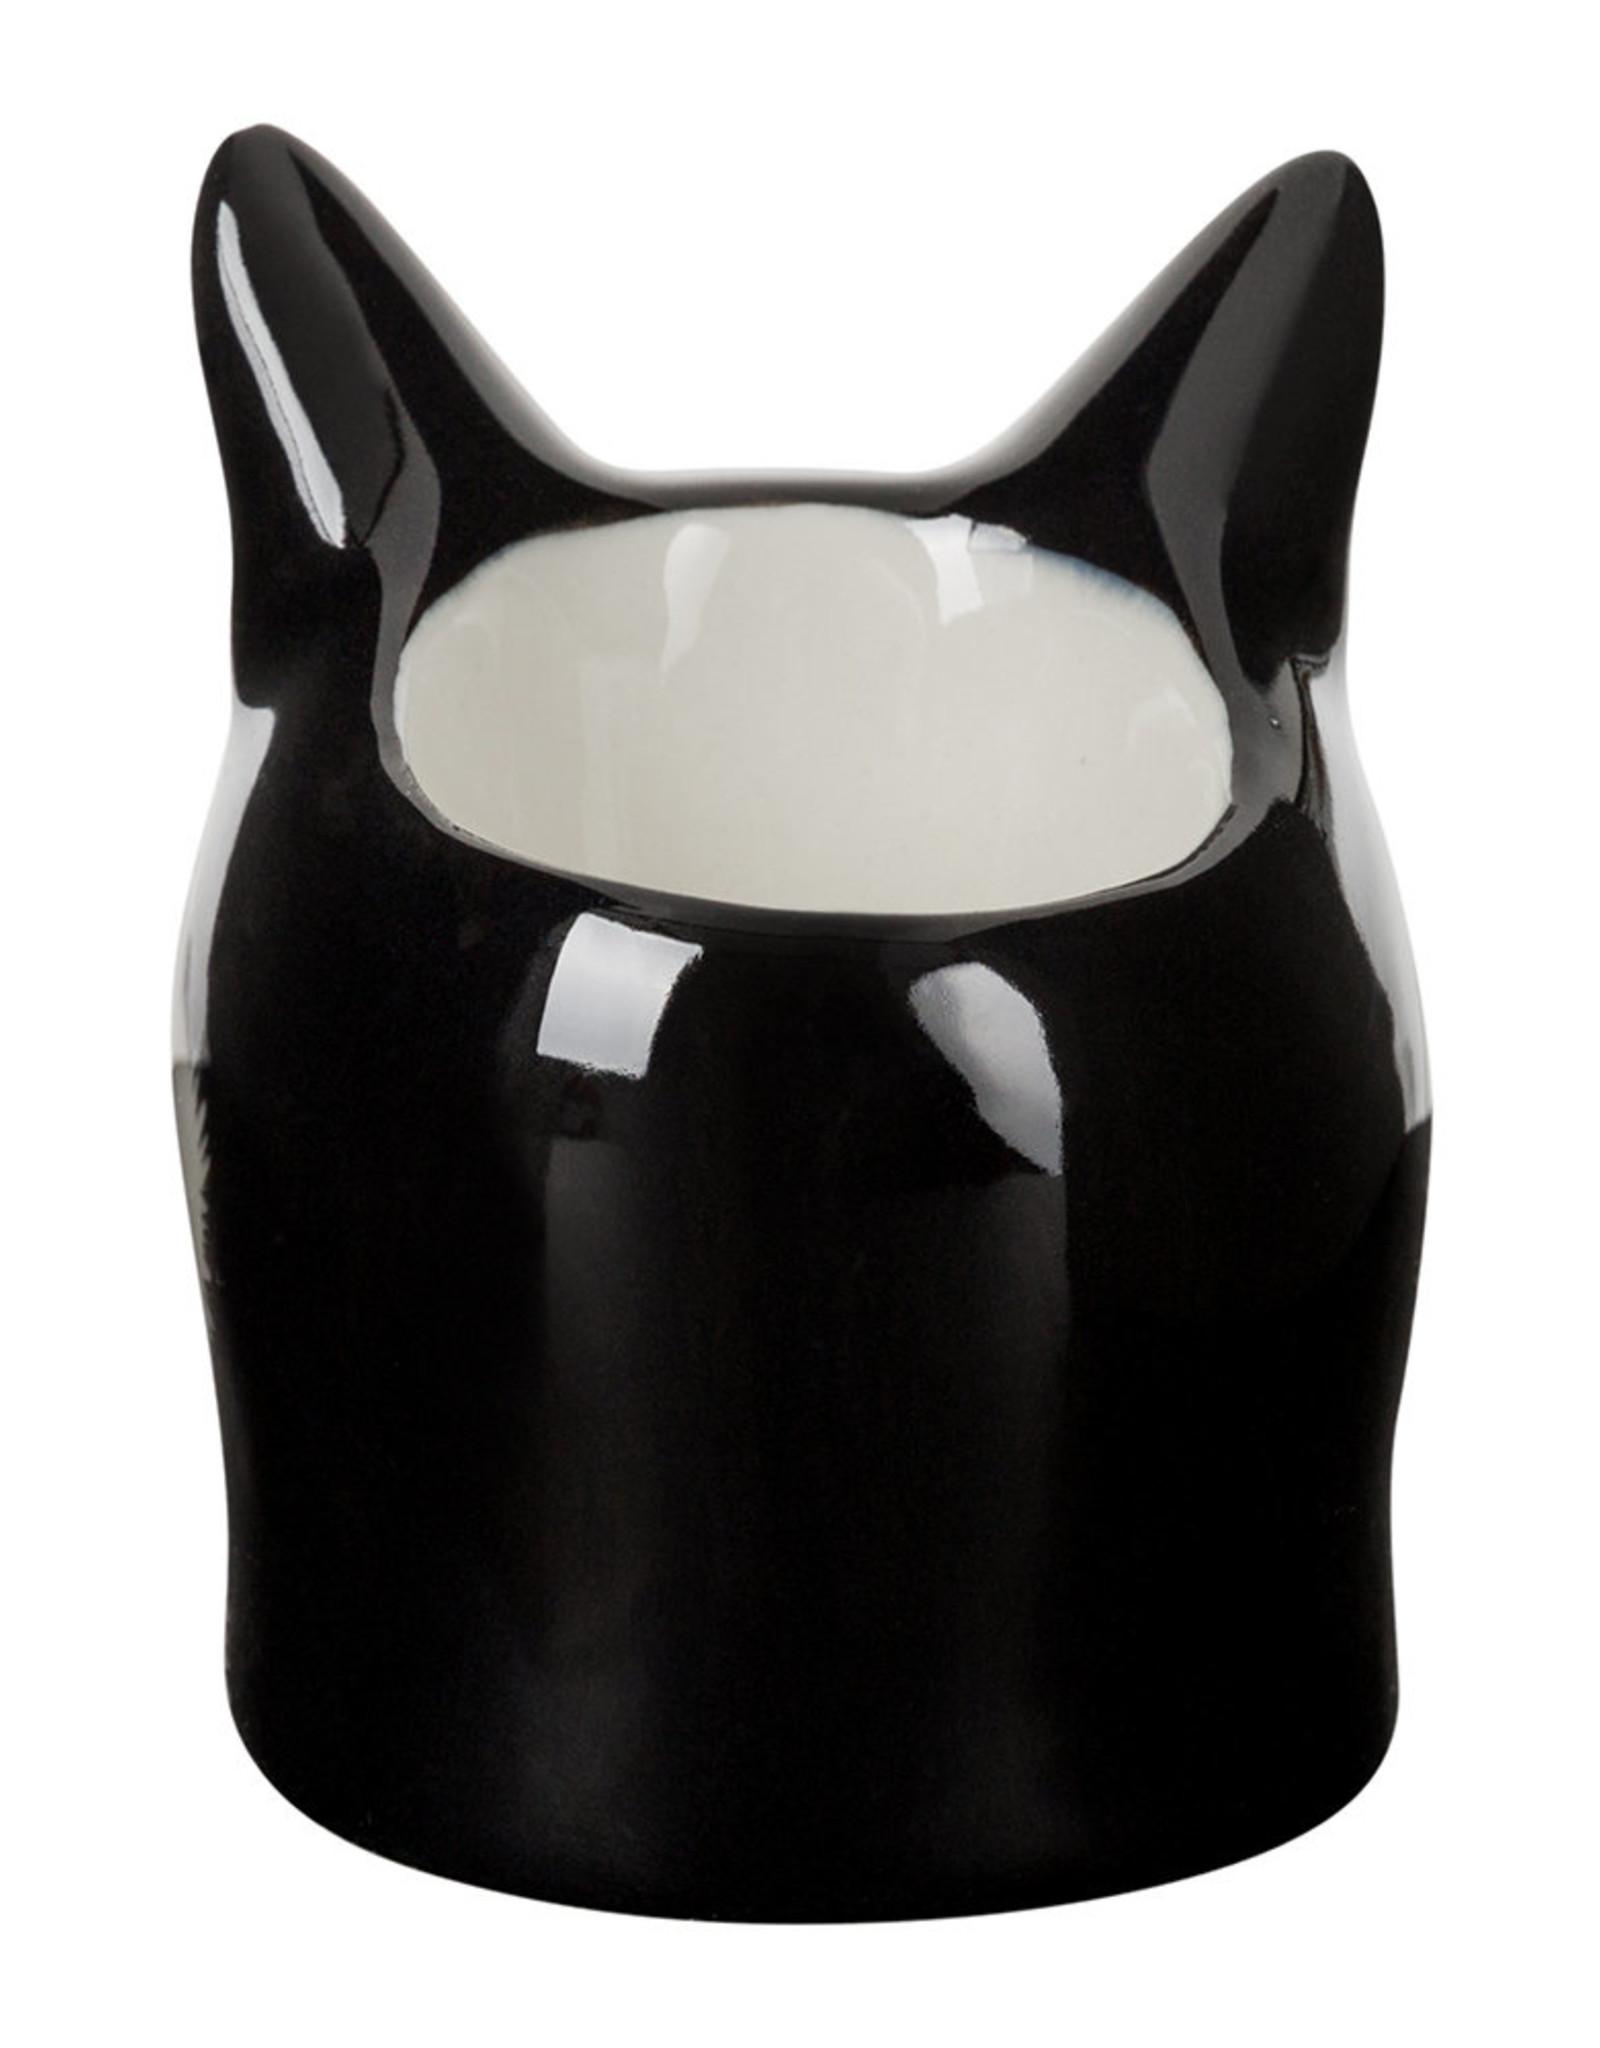 Quail Ceramics Quail Barney Face Egg Cup (tux) - Klein